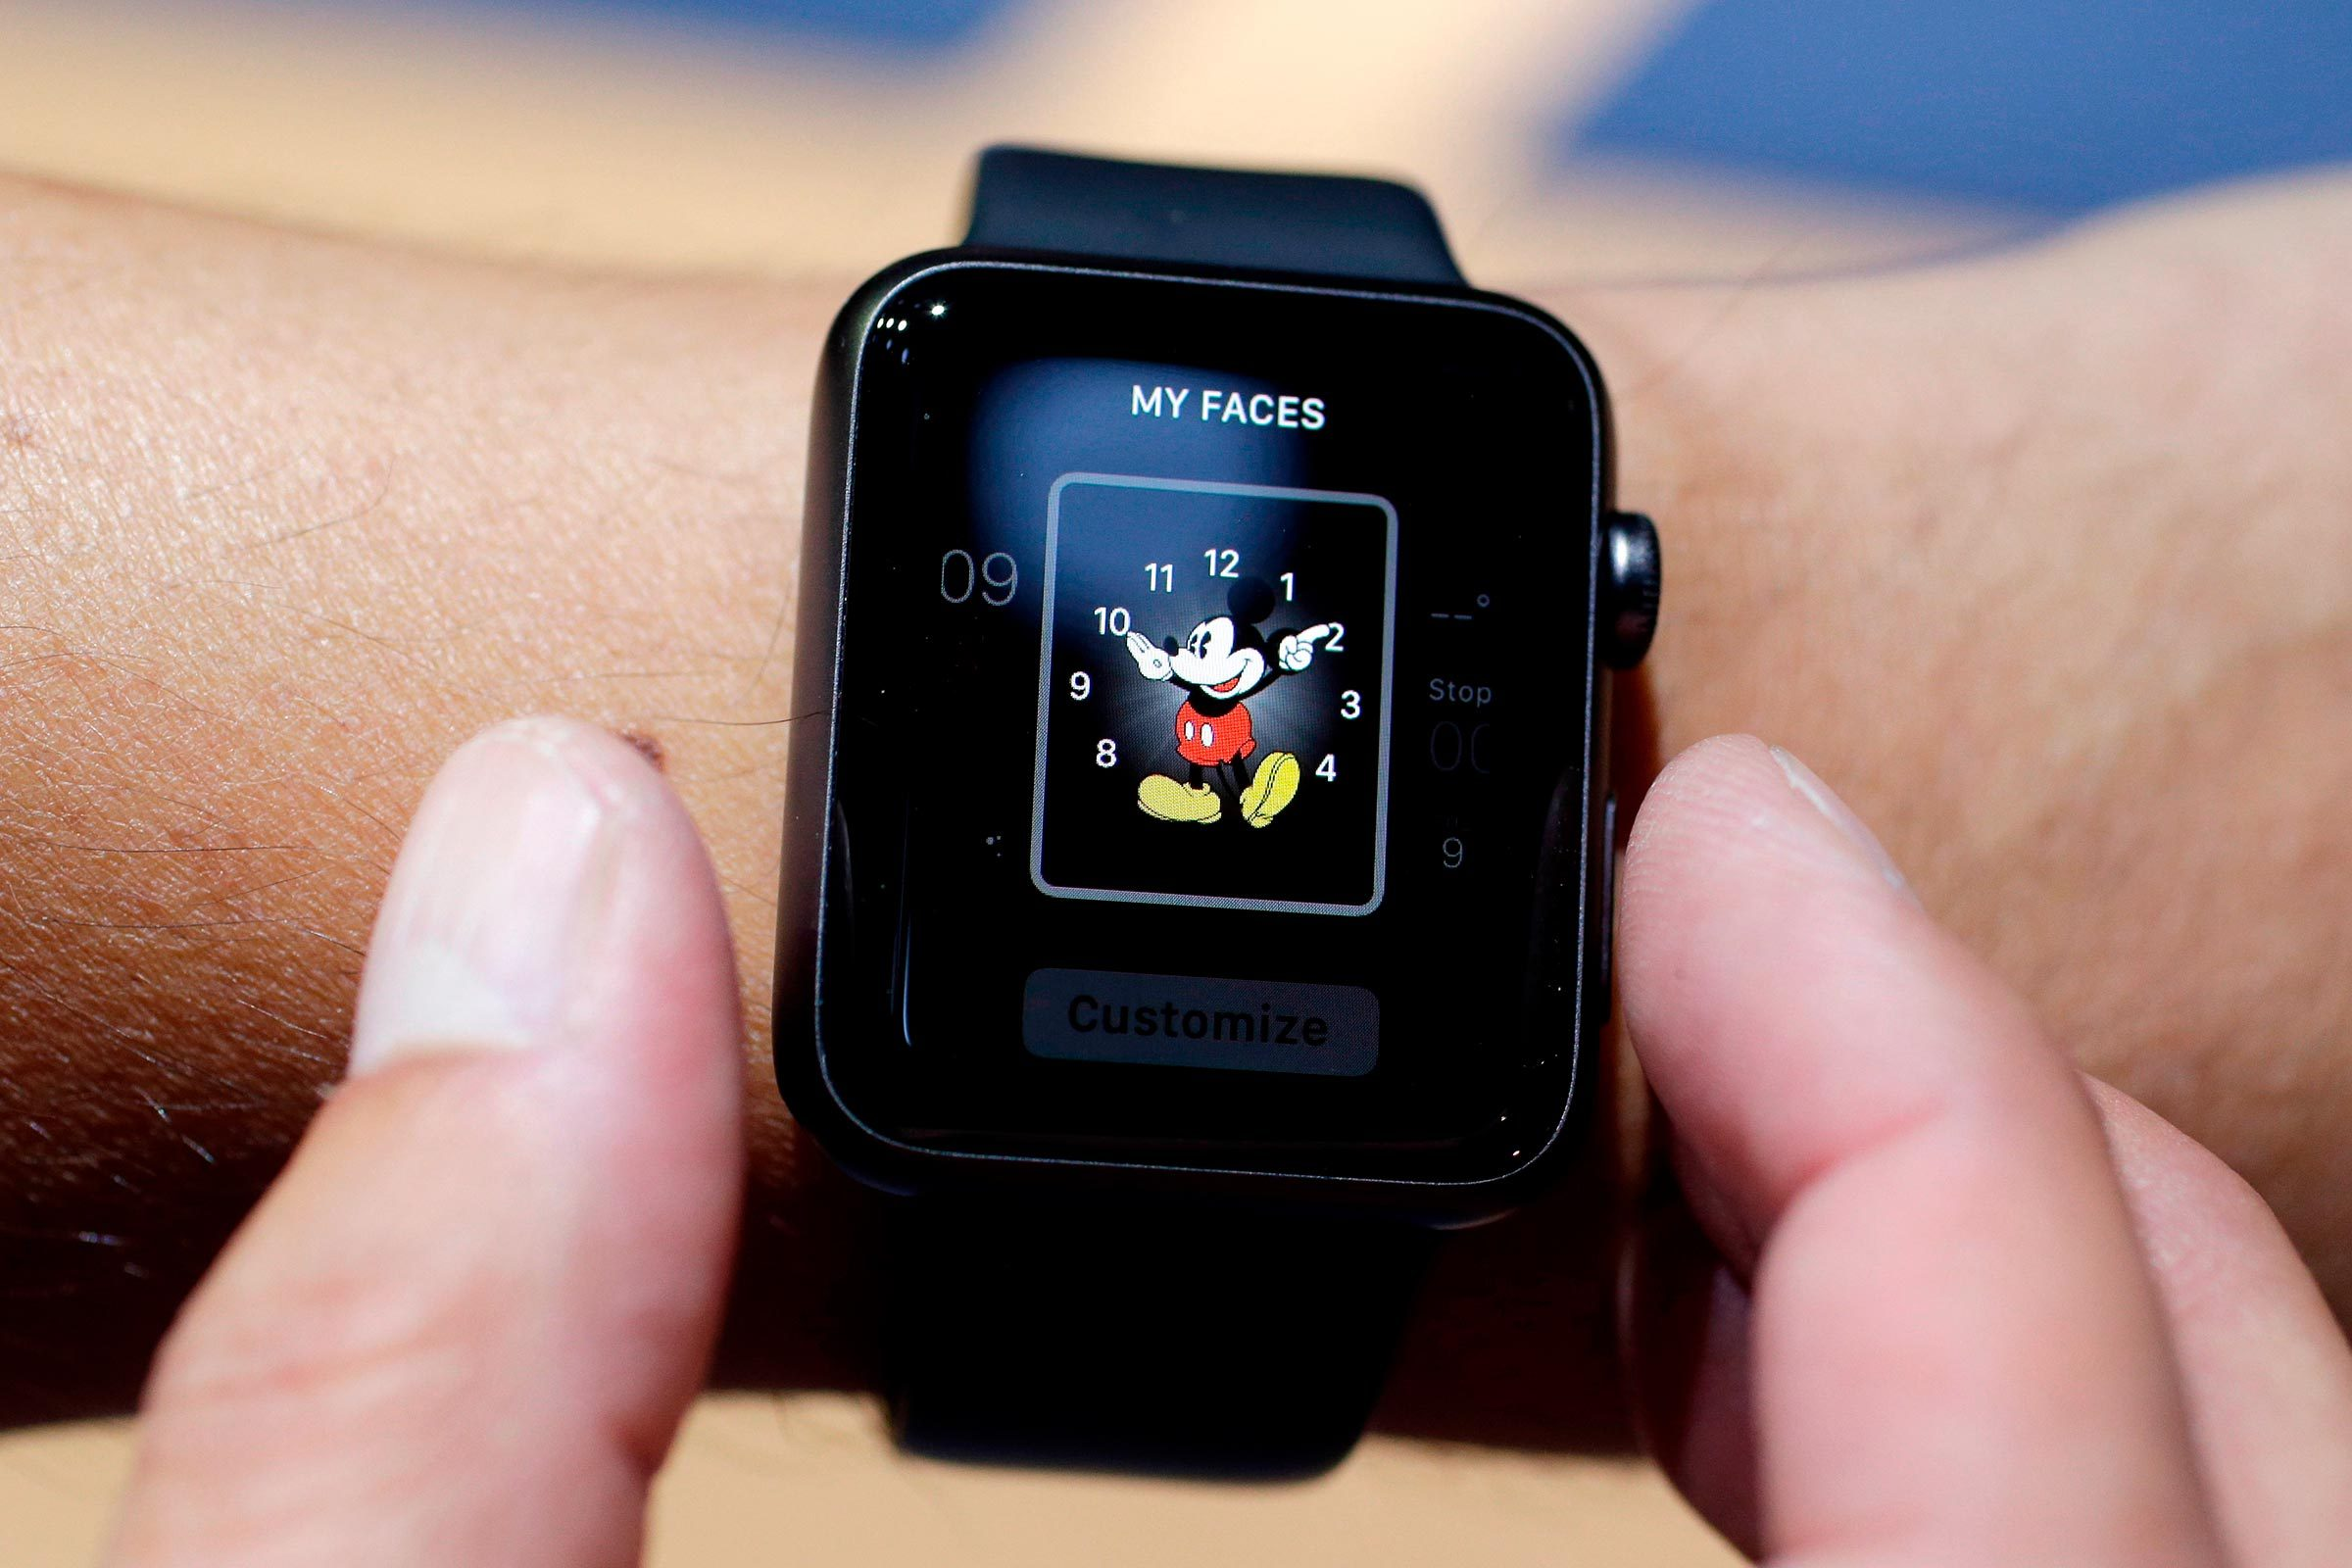 Mickey apple watch